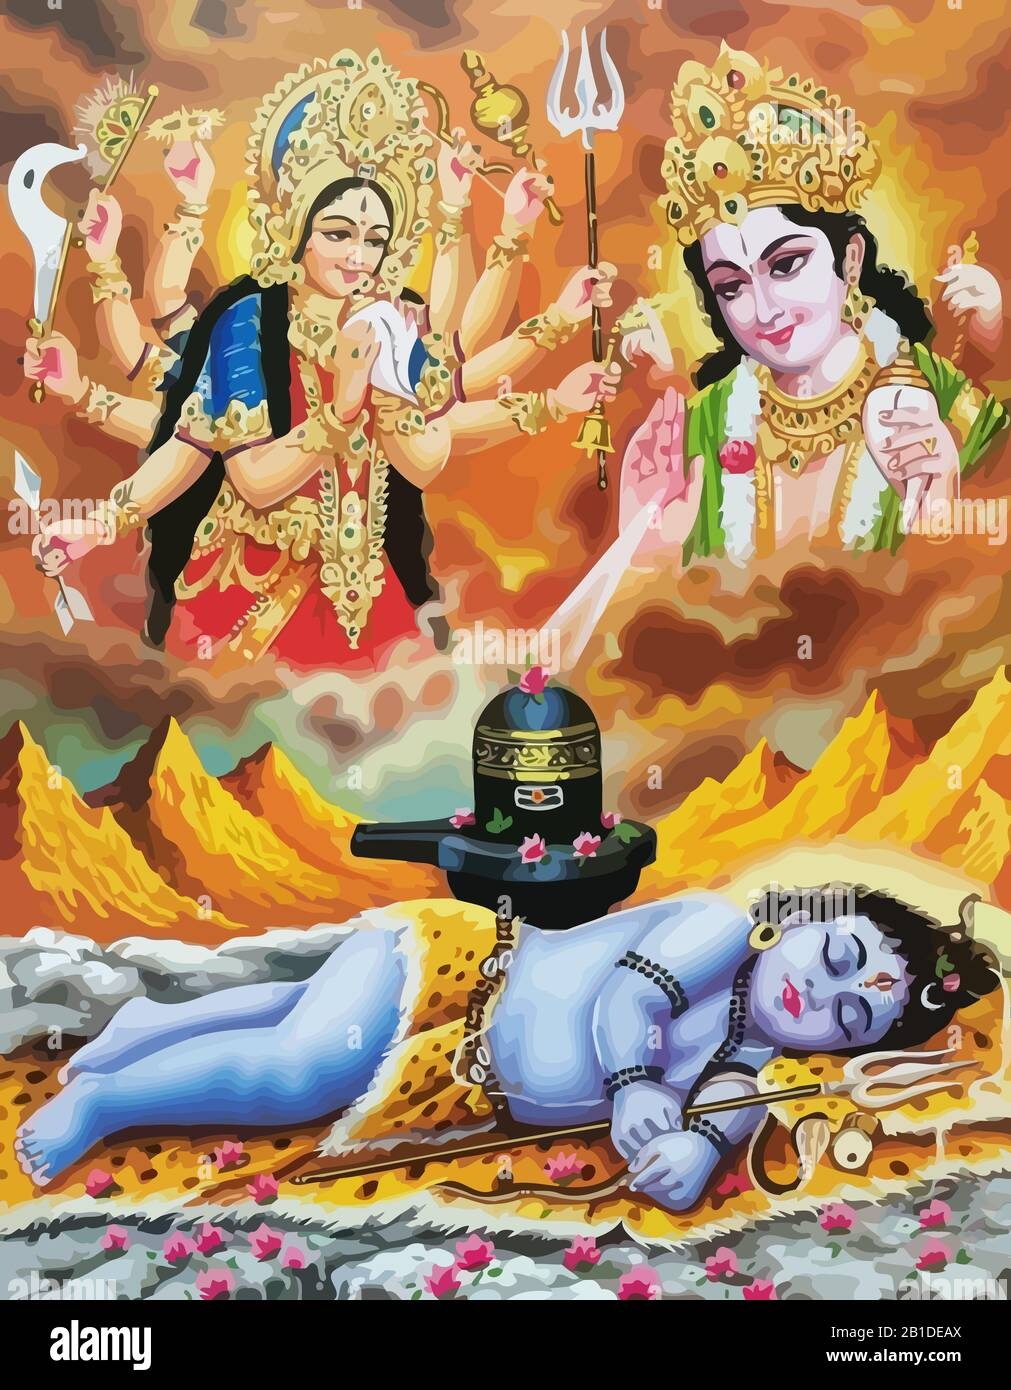 lord surya and durga baby krishna mythology hinduism illustration 2B1DEAX